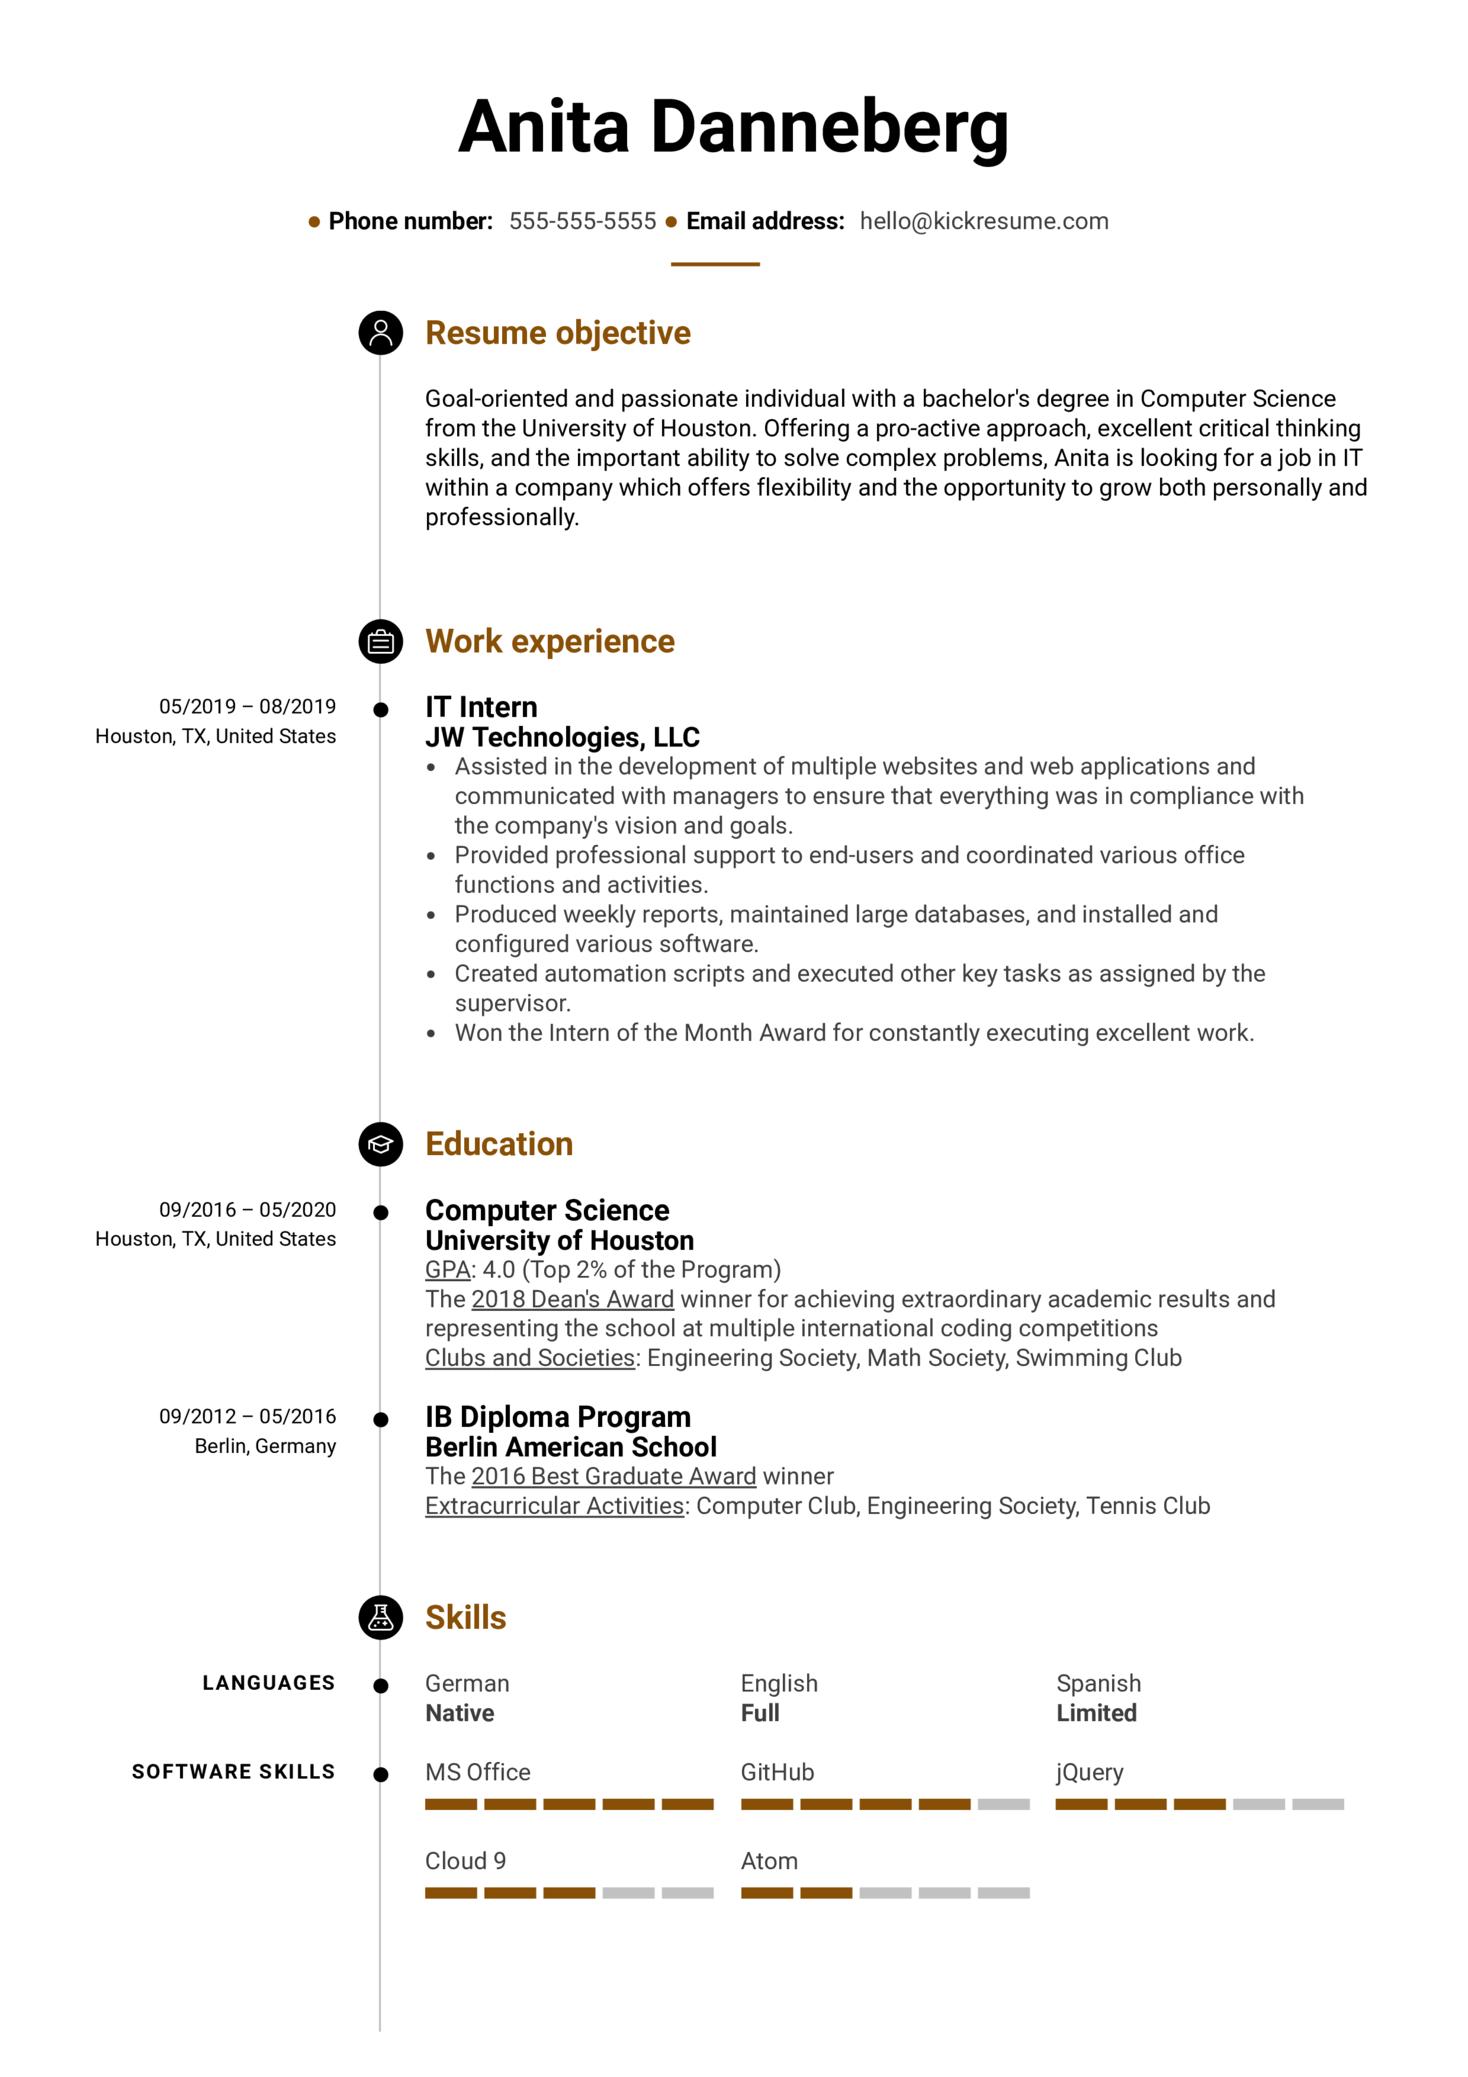 College Graduate Resume Template (Part 1)